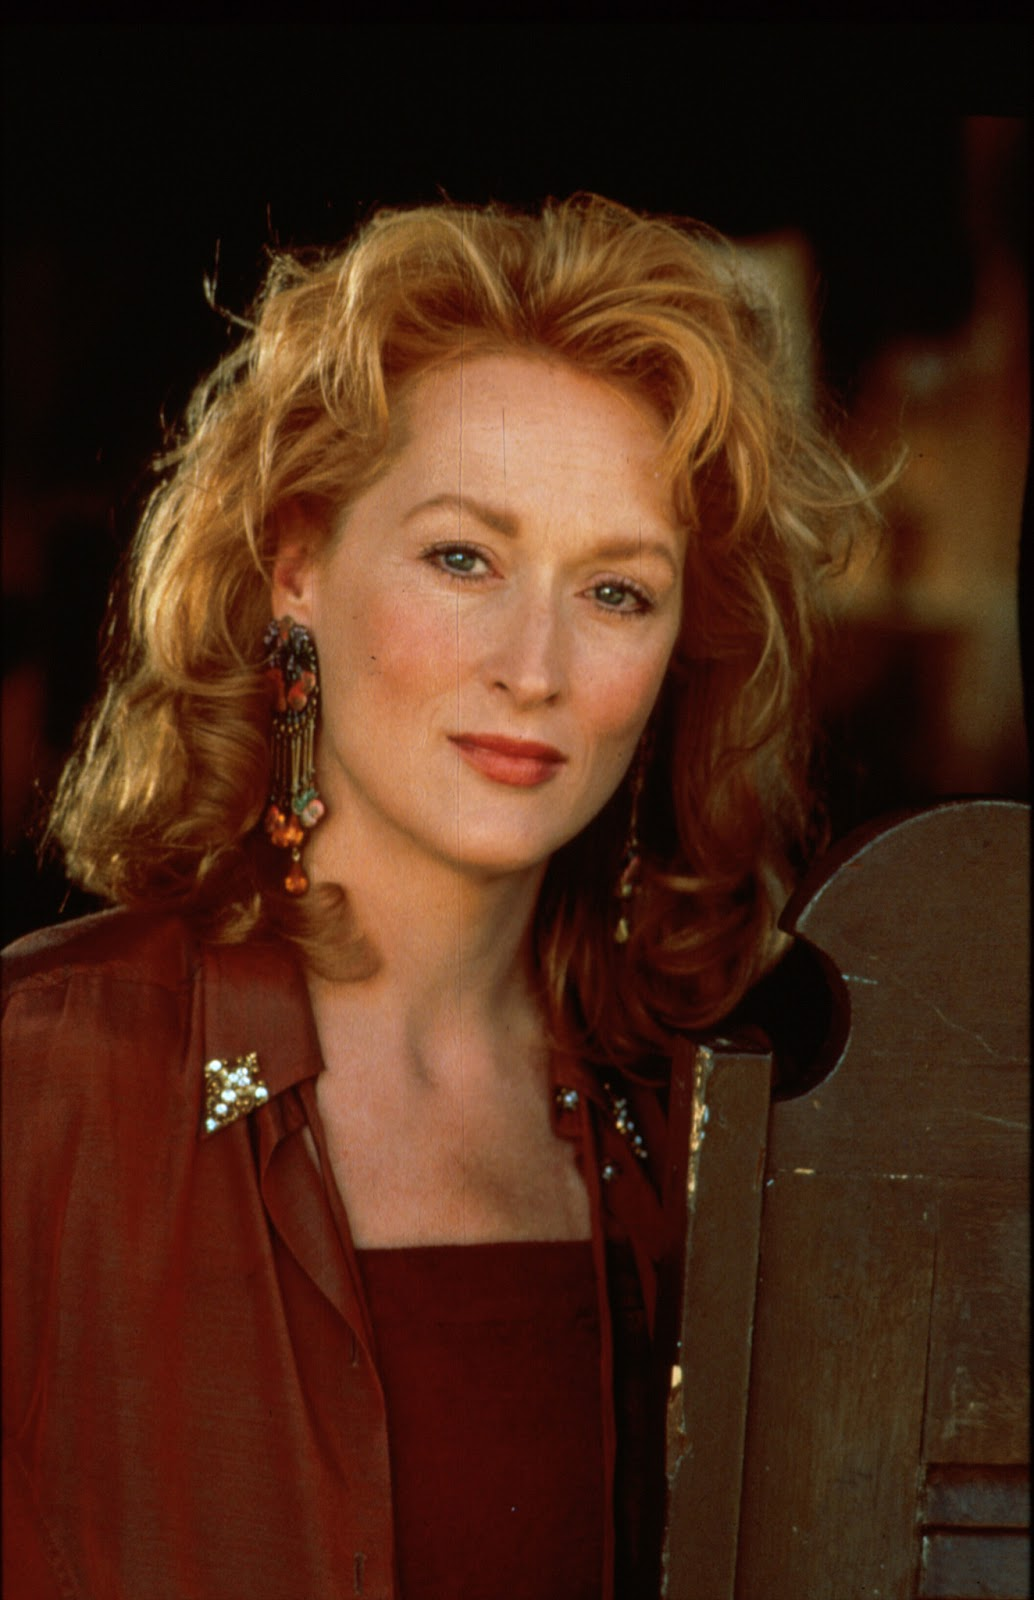 Meryl Streep 5 Meryl Streep 6 Meryl Streep 7 Meryl